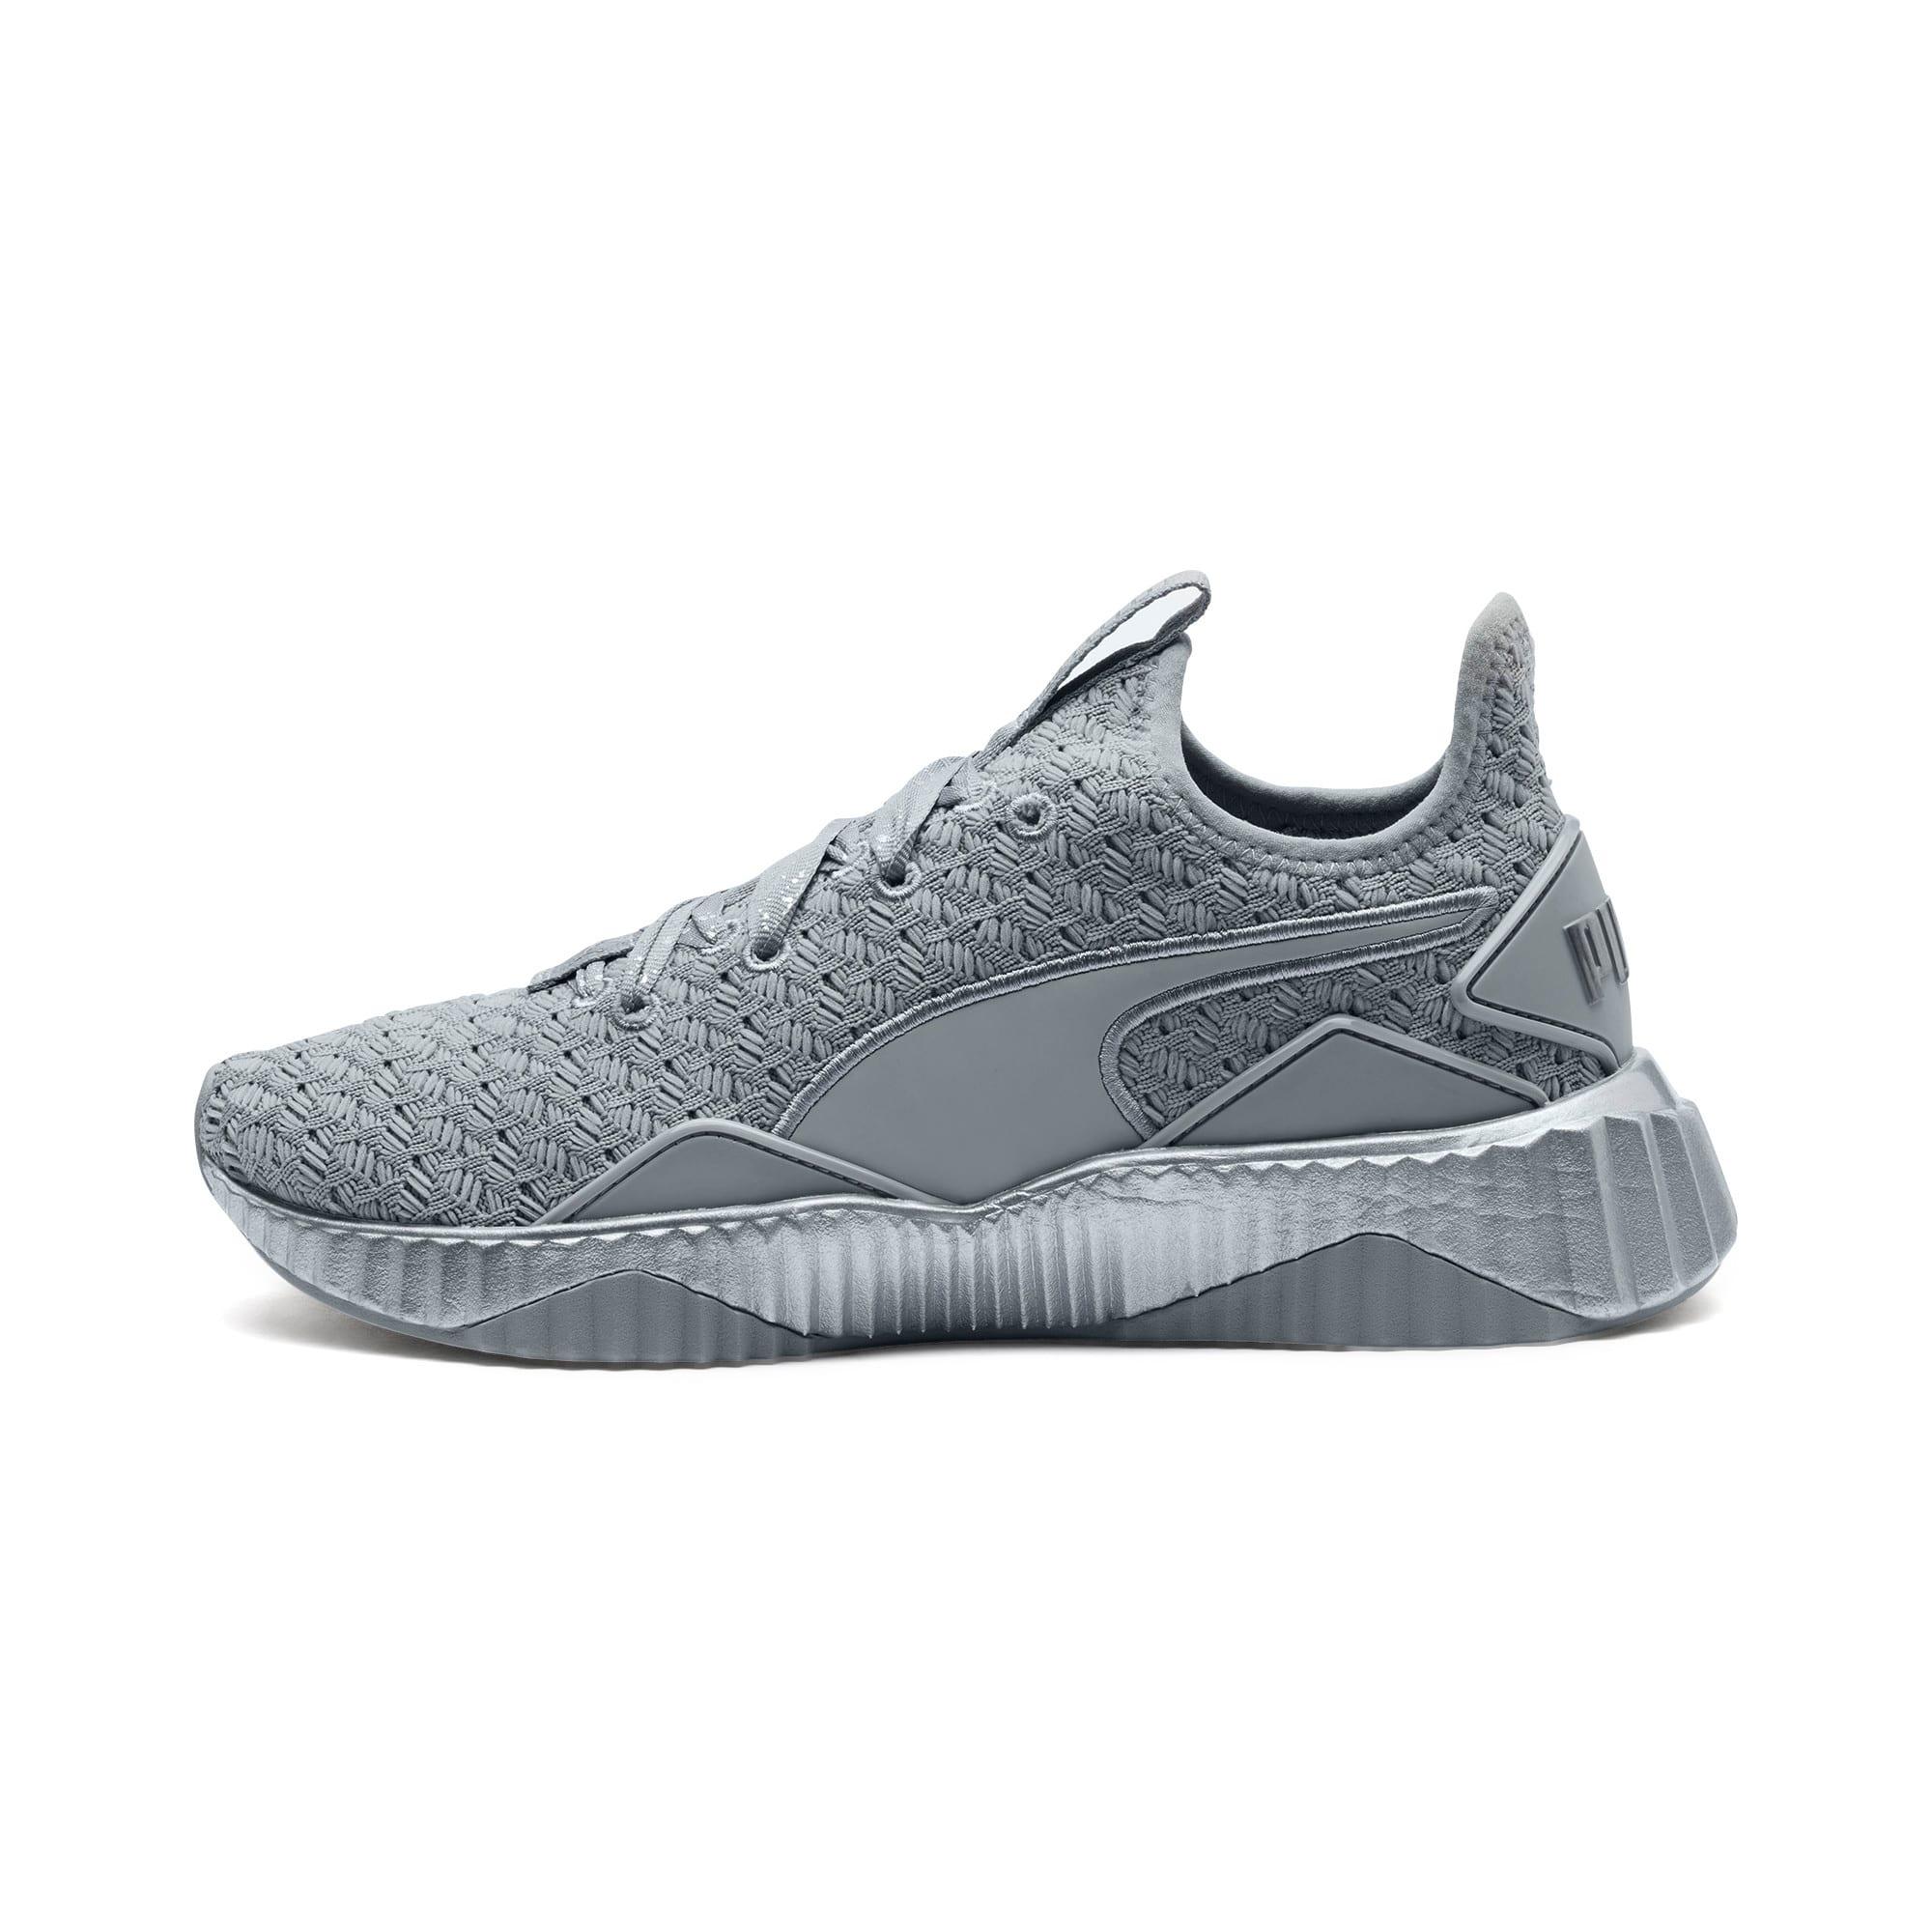 Thumbnail 1 of Defy Sparkle Women's Training Shoes, Quarry-Puma Silver, medium